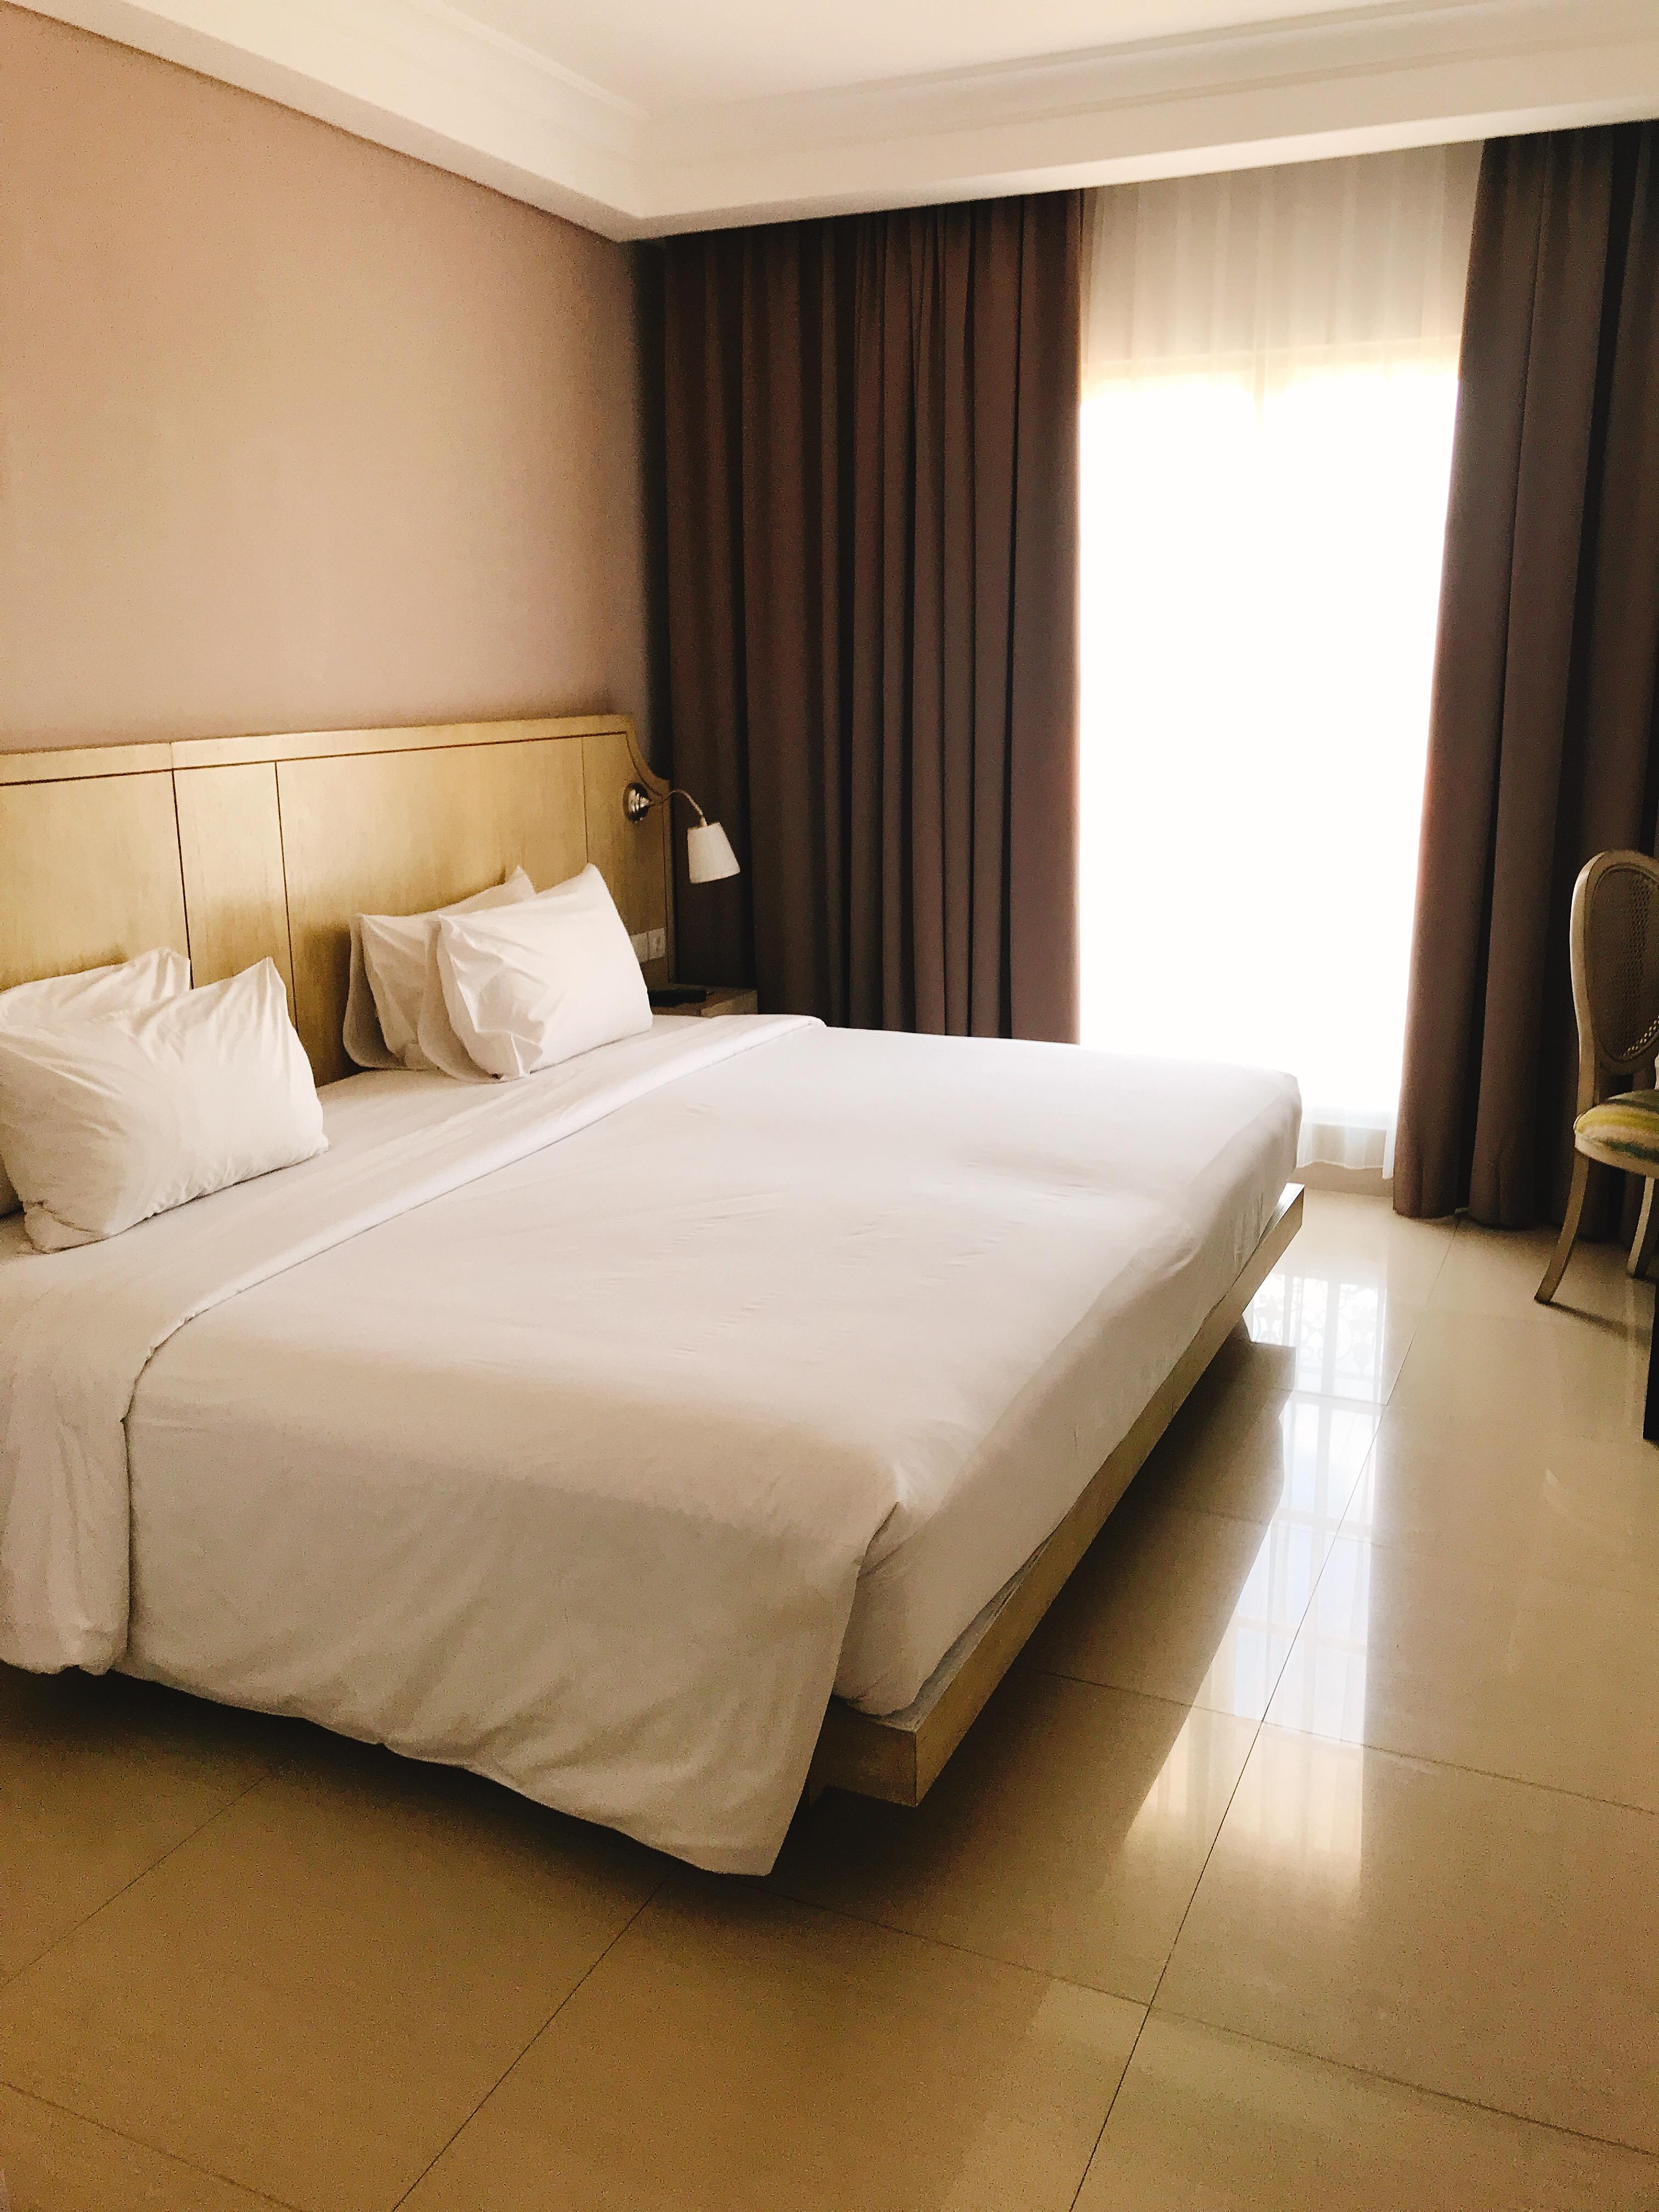 Hotel Santika Seminyak Bali【ホテルサンティカ スミニャック バリ】